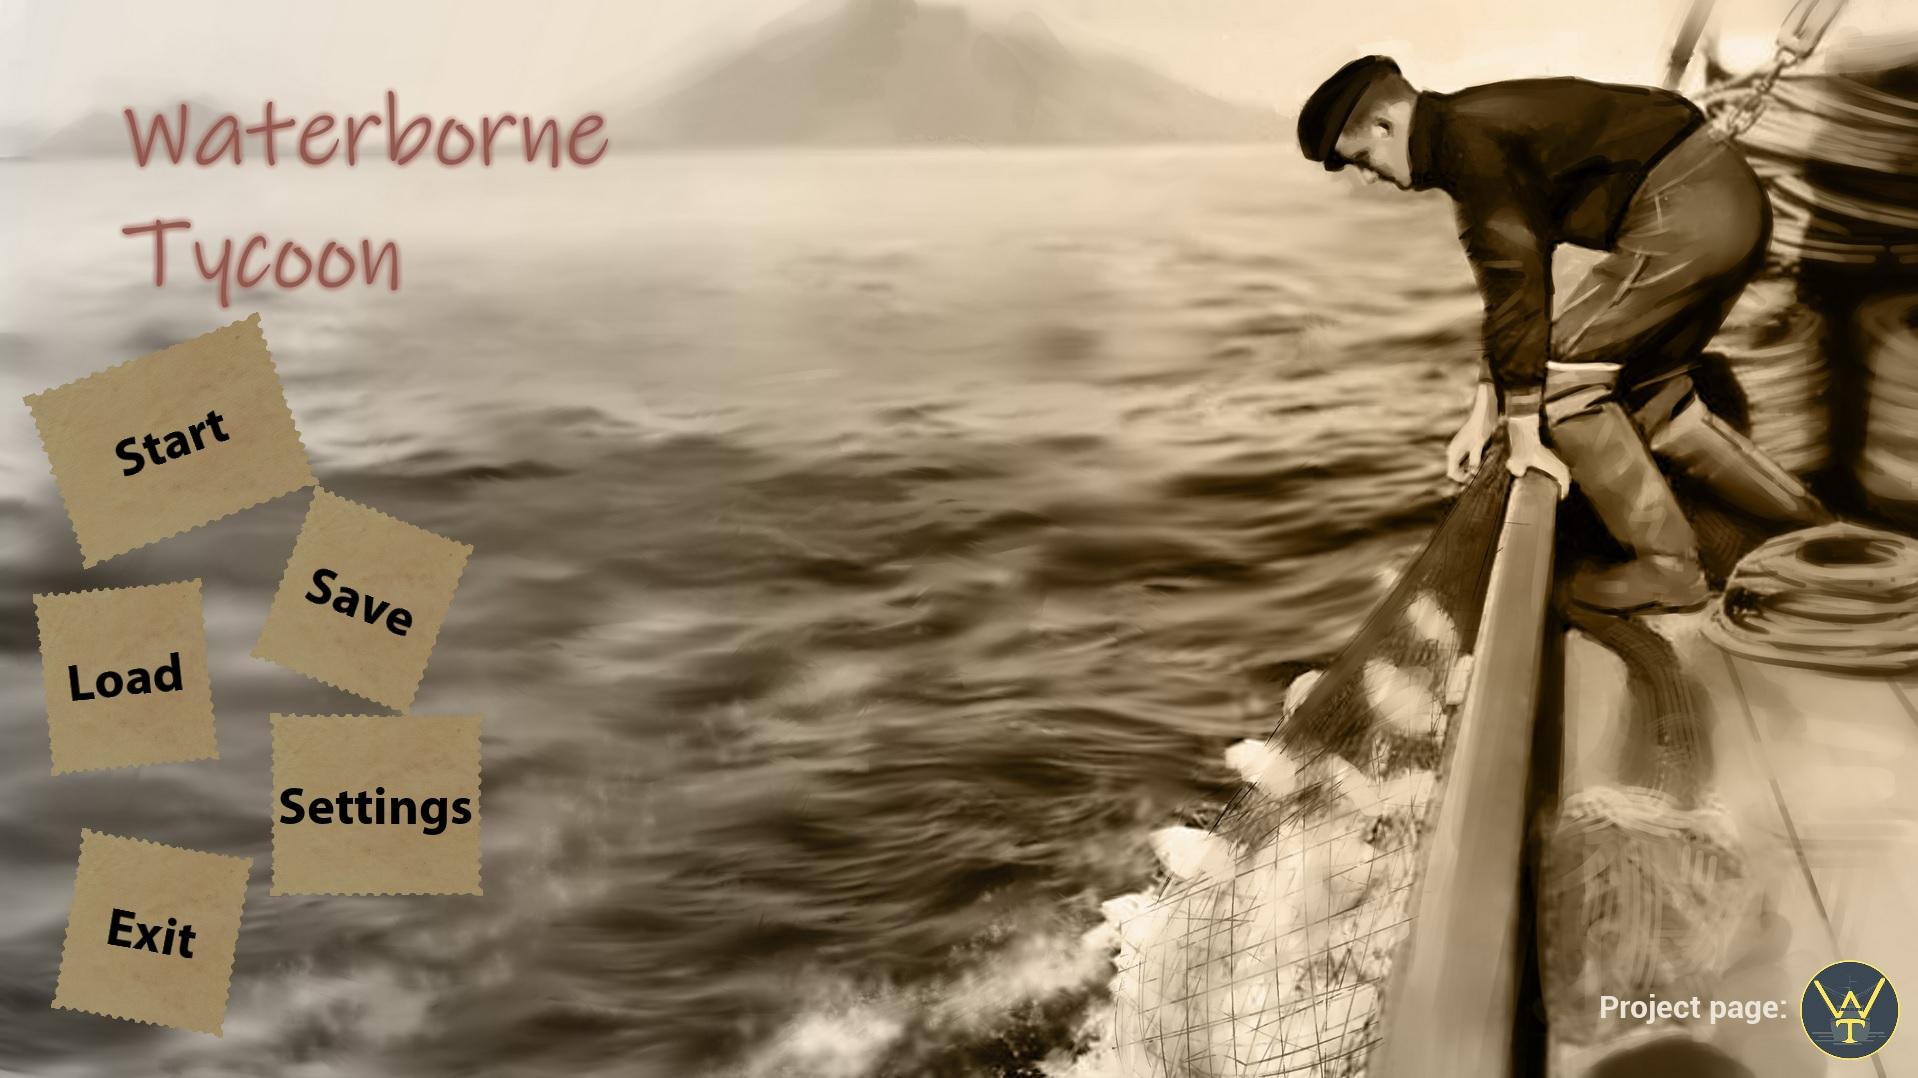 startpage1 | Waterborne Tycoon